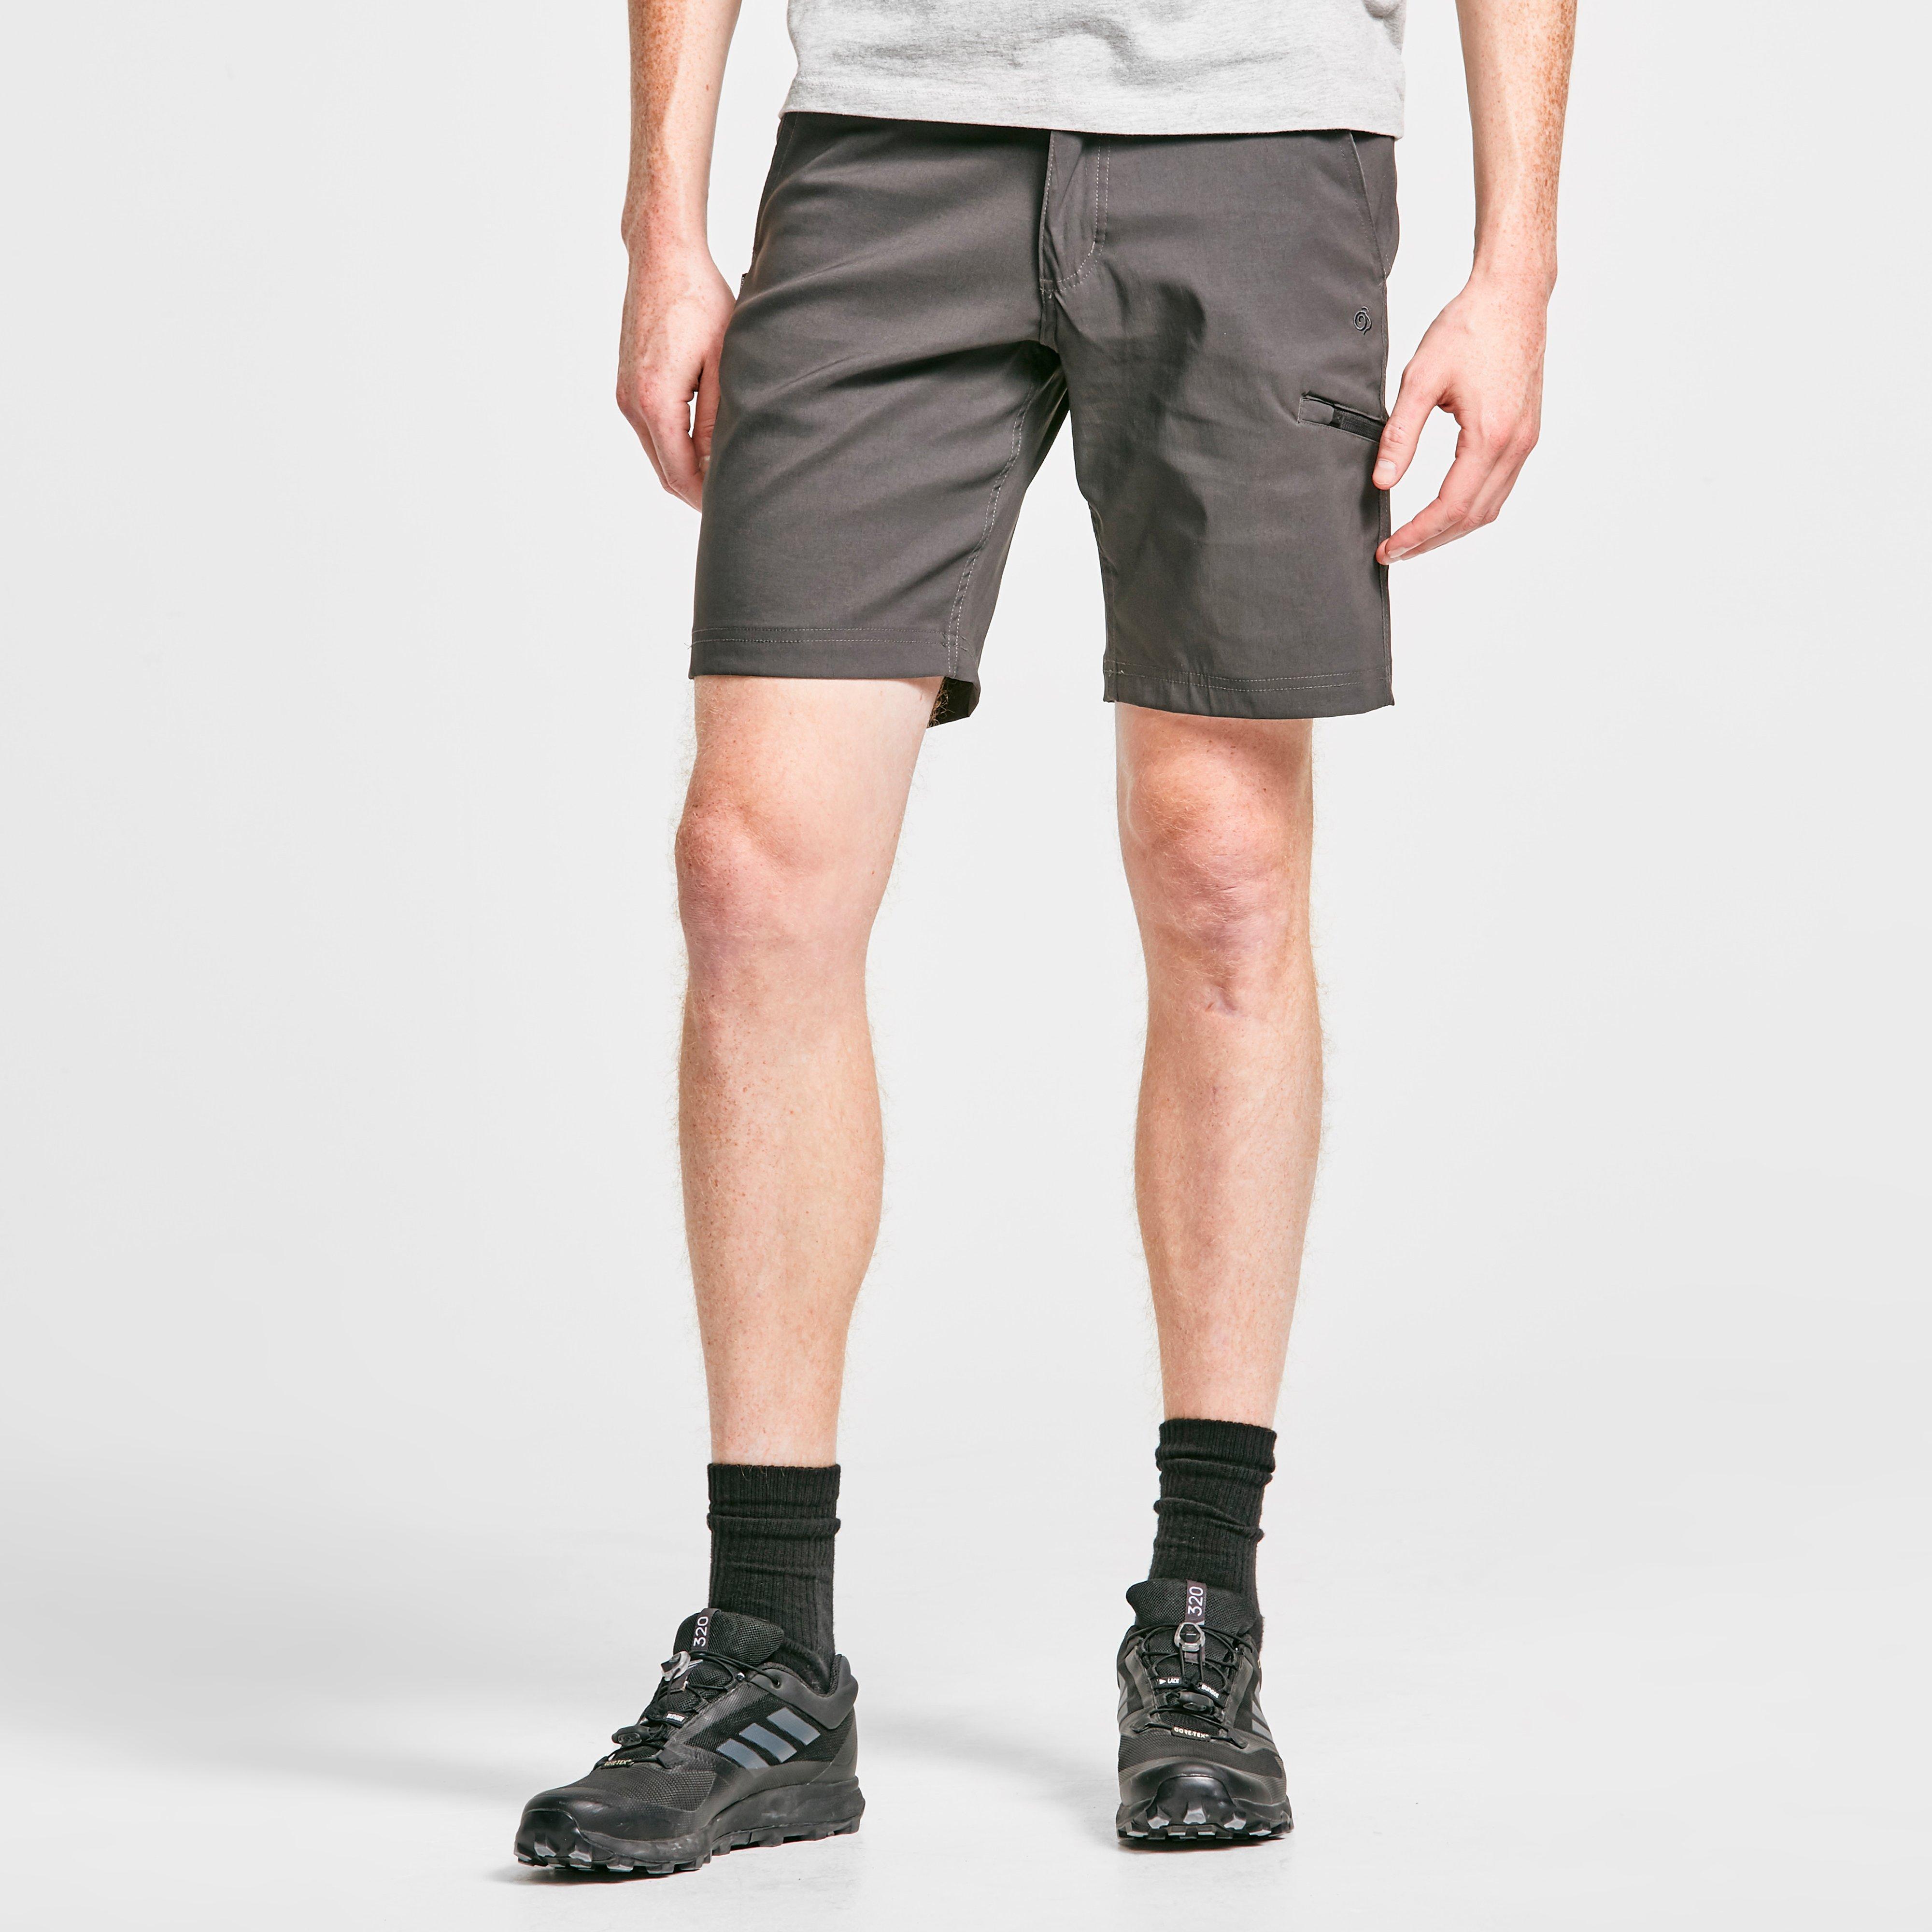 Craghoppers Men's Kiwi Pro Shorts, Dark grey/DGY$